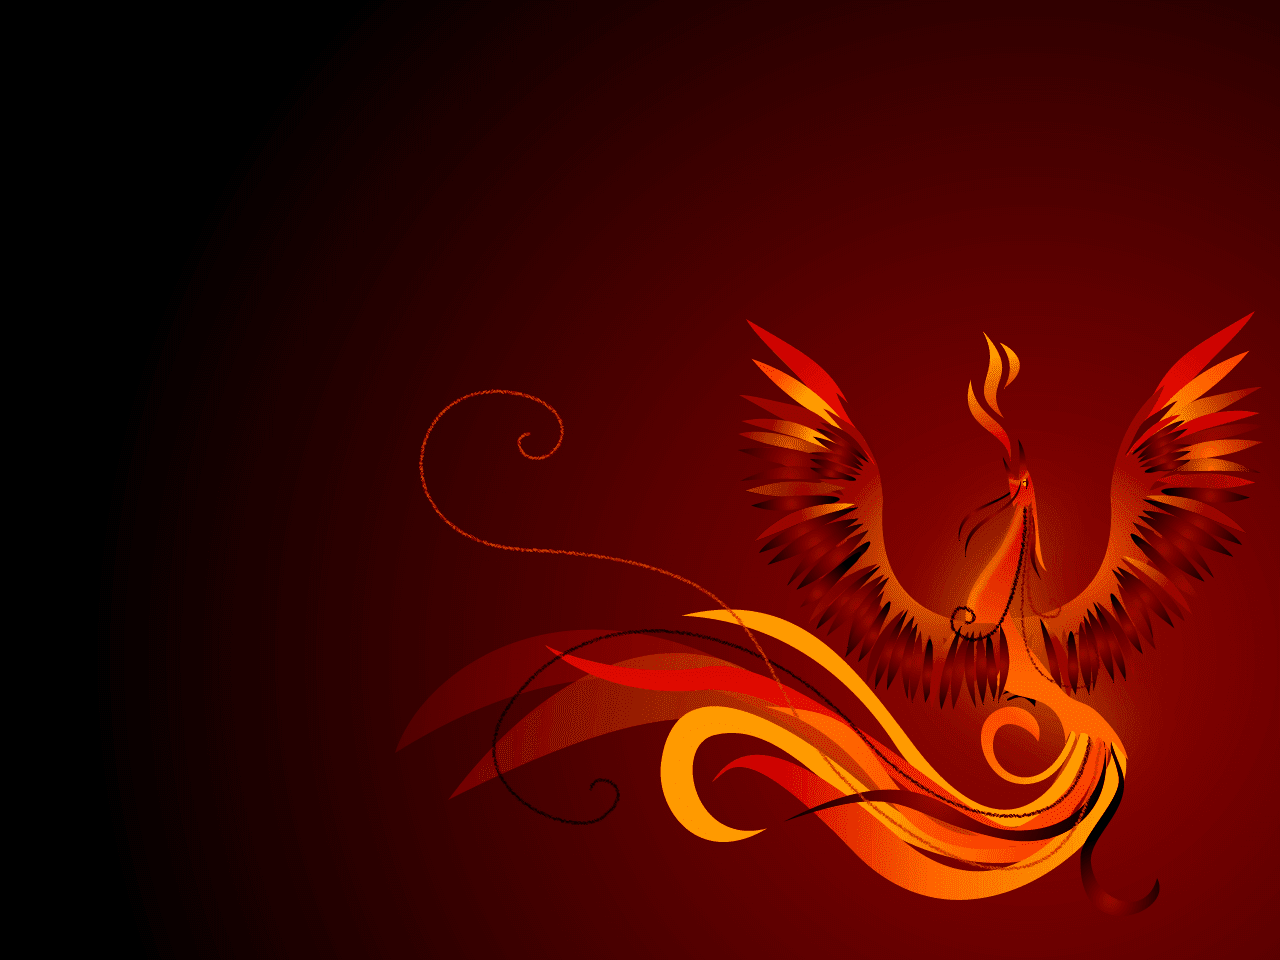 Phoenix Wallpaper Hd Wallpapers